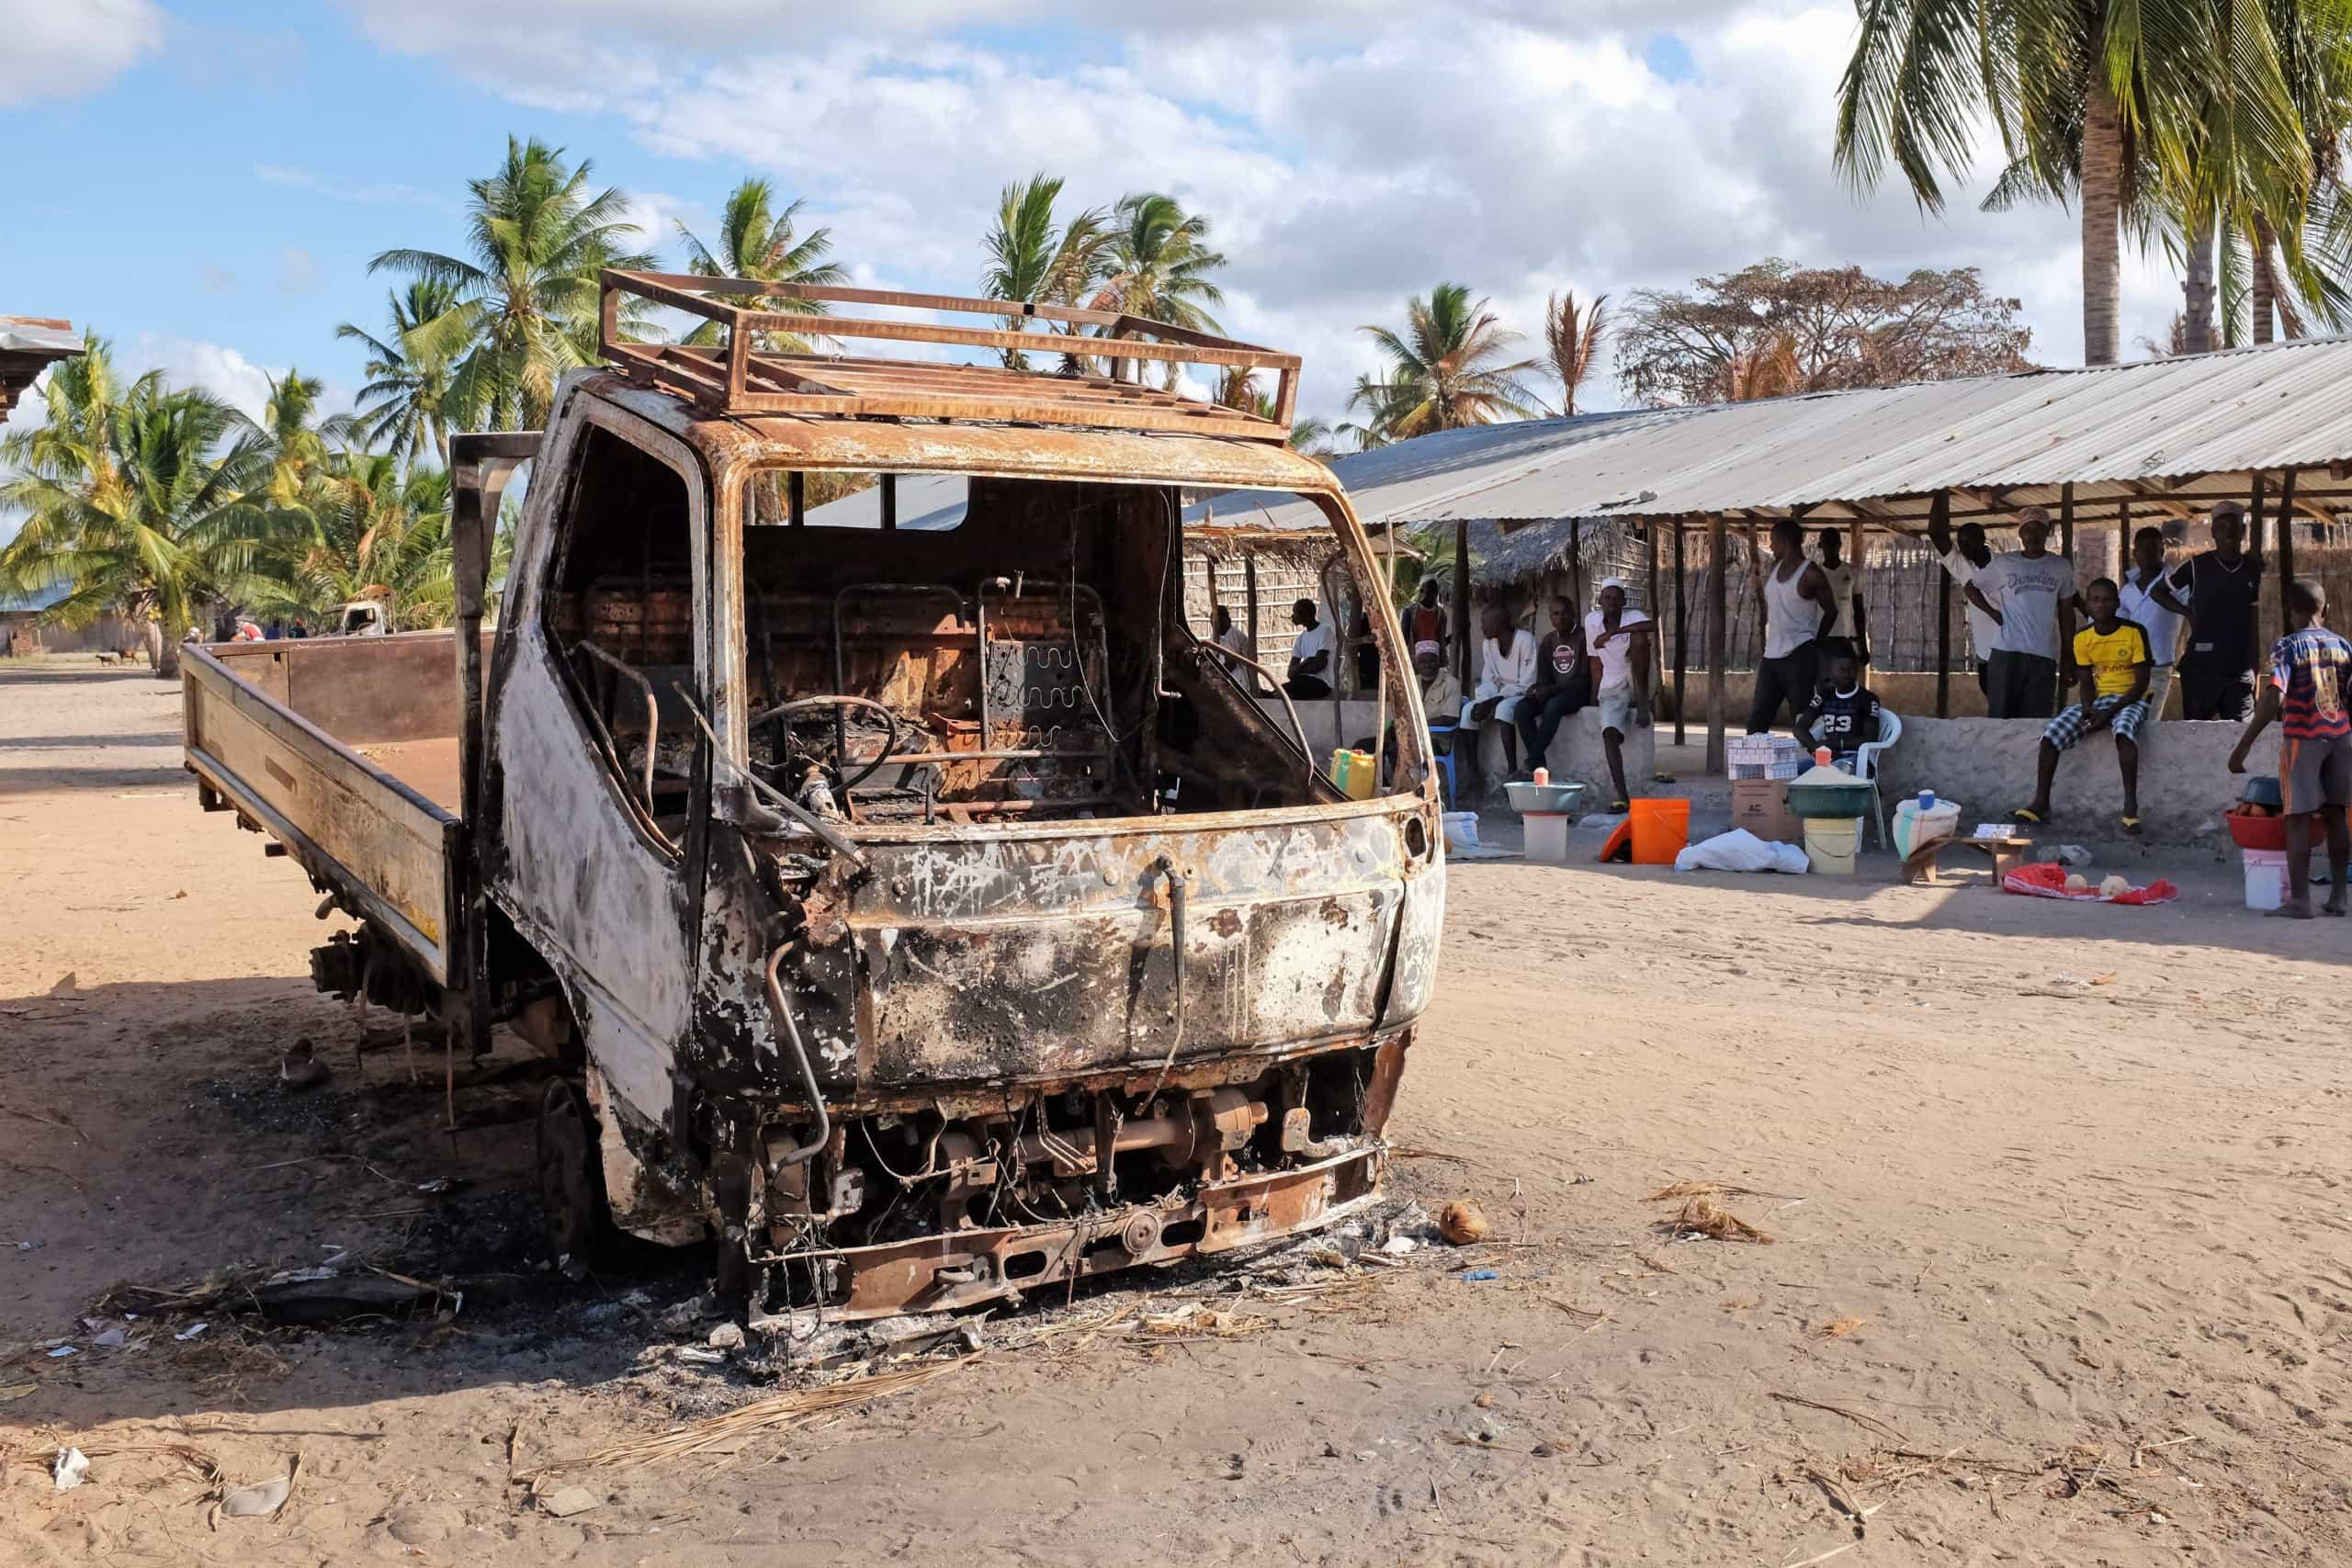 Justiça moçambicana acusa provisoriamente jornalistas detidos